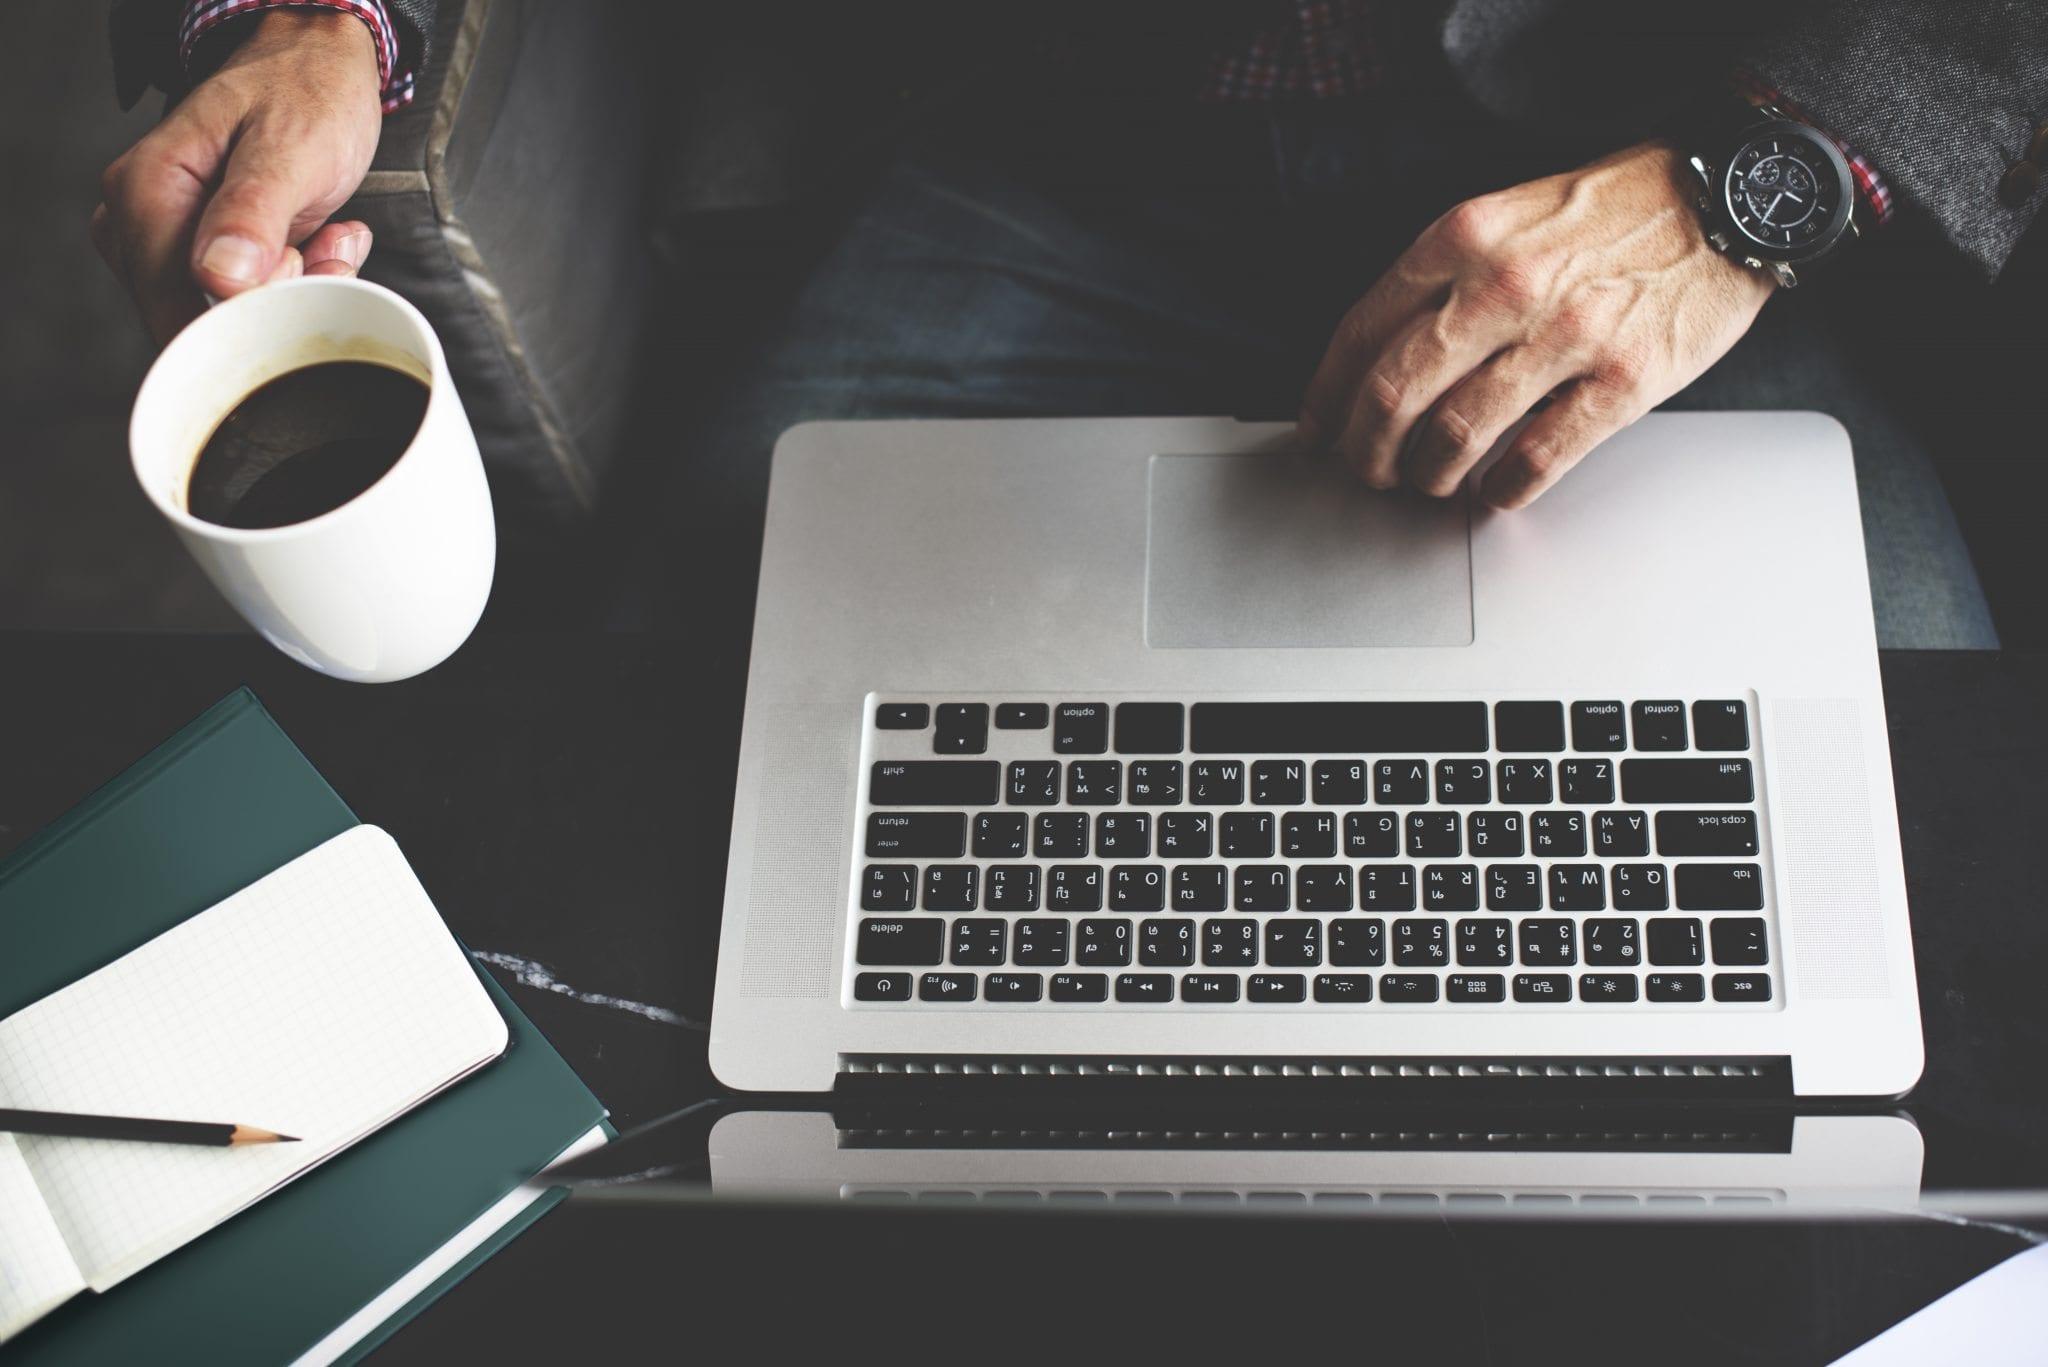 HR programs in the cloud